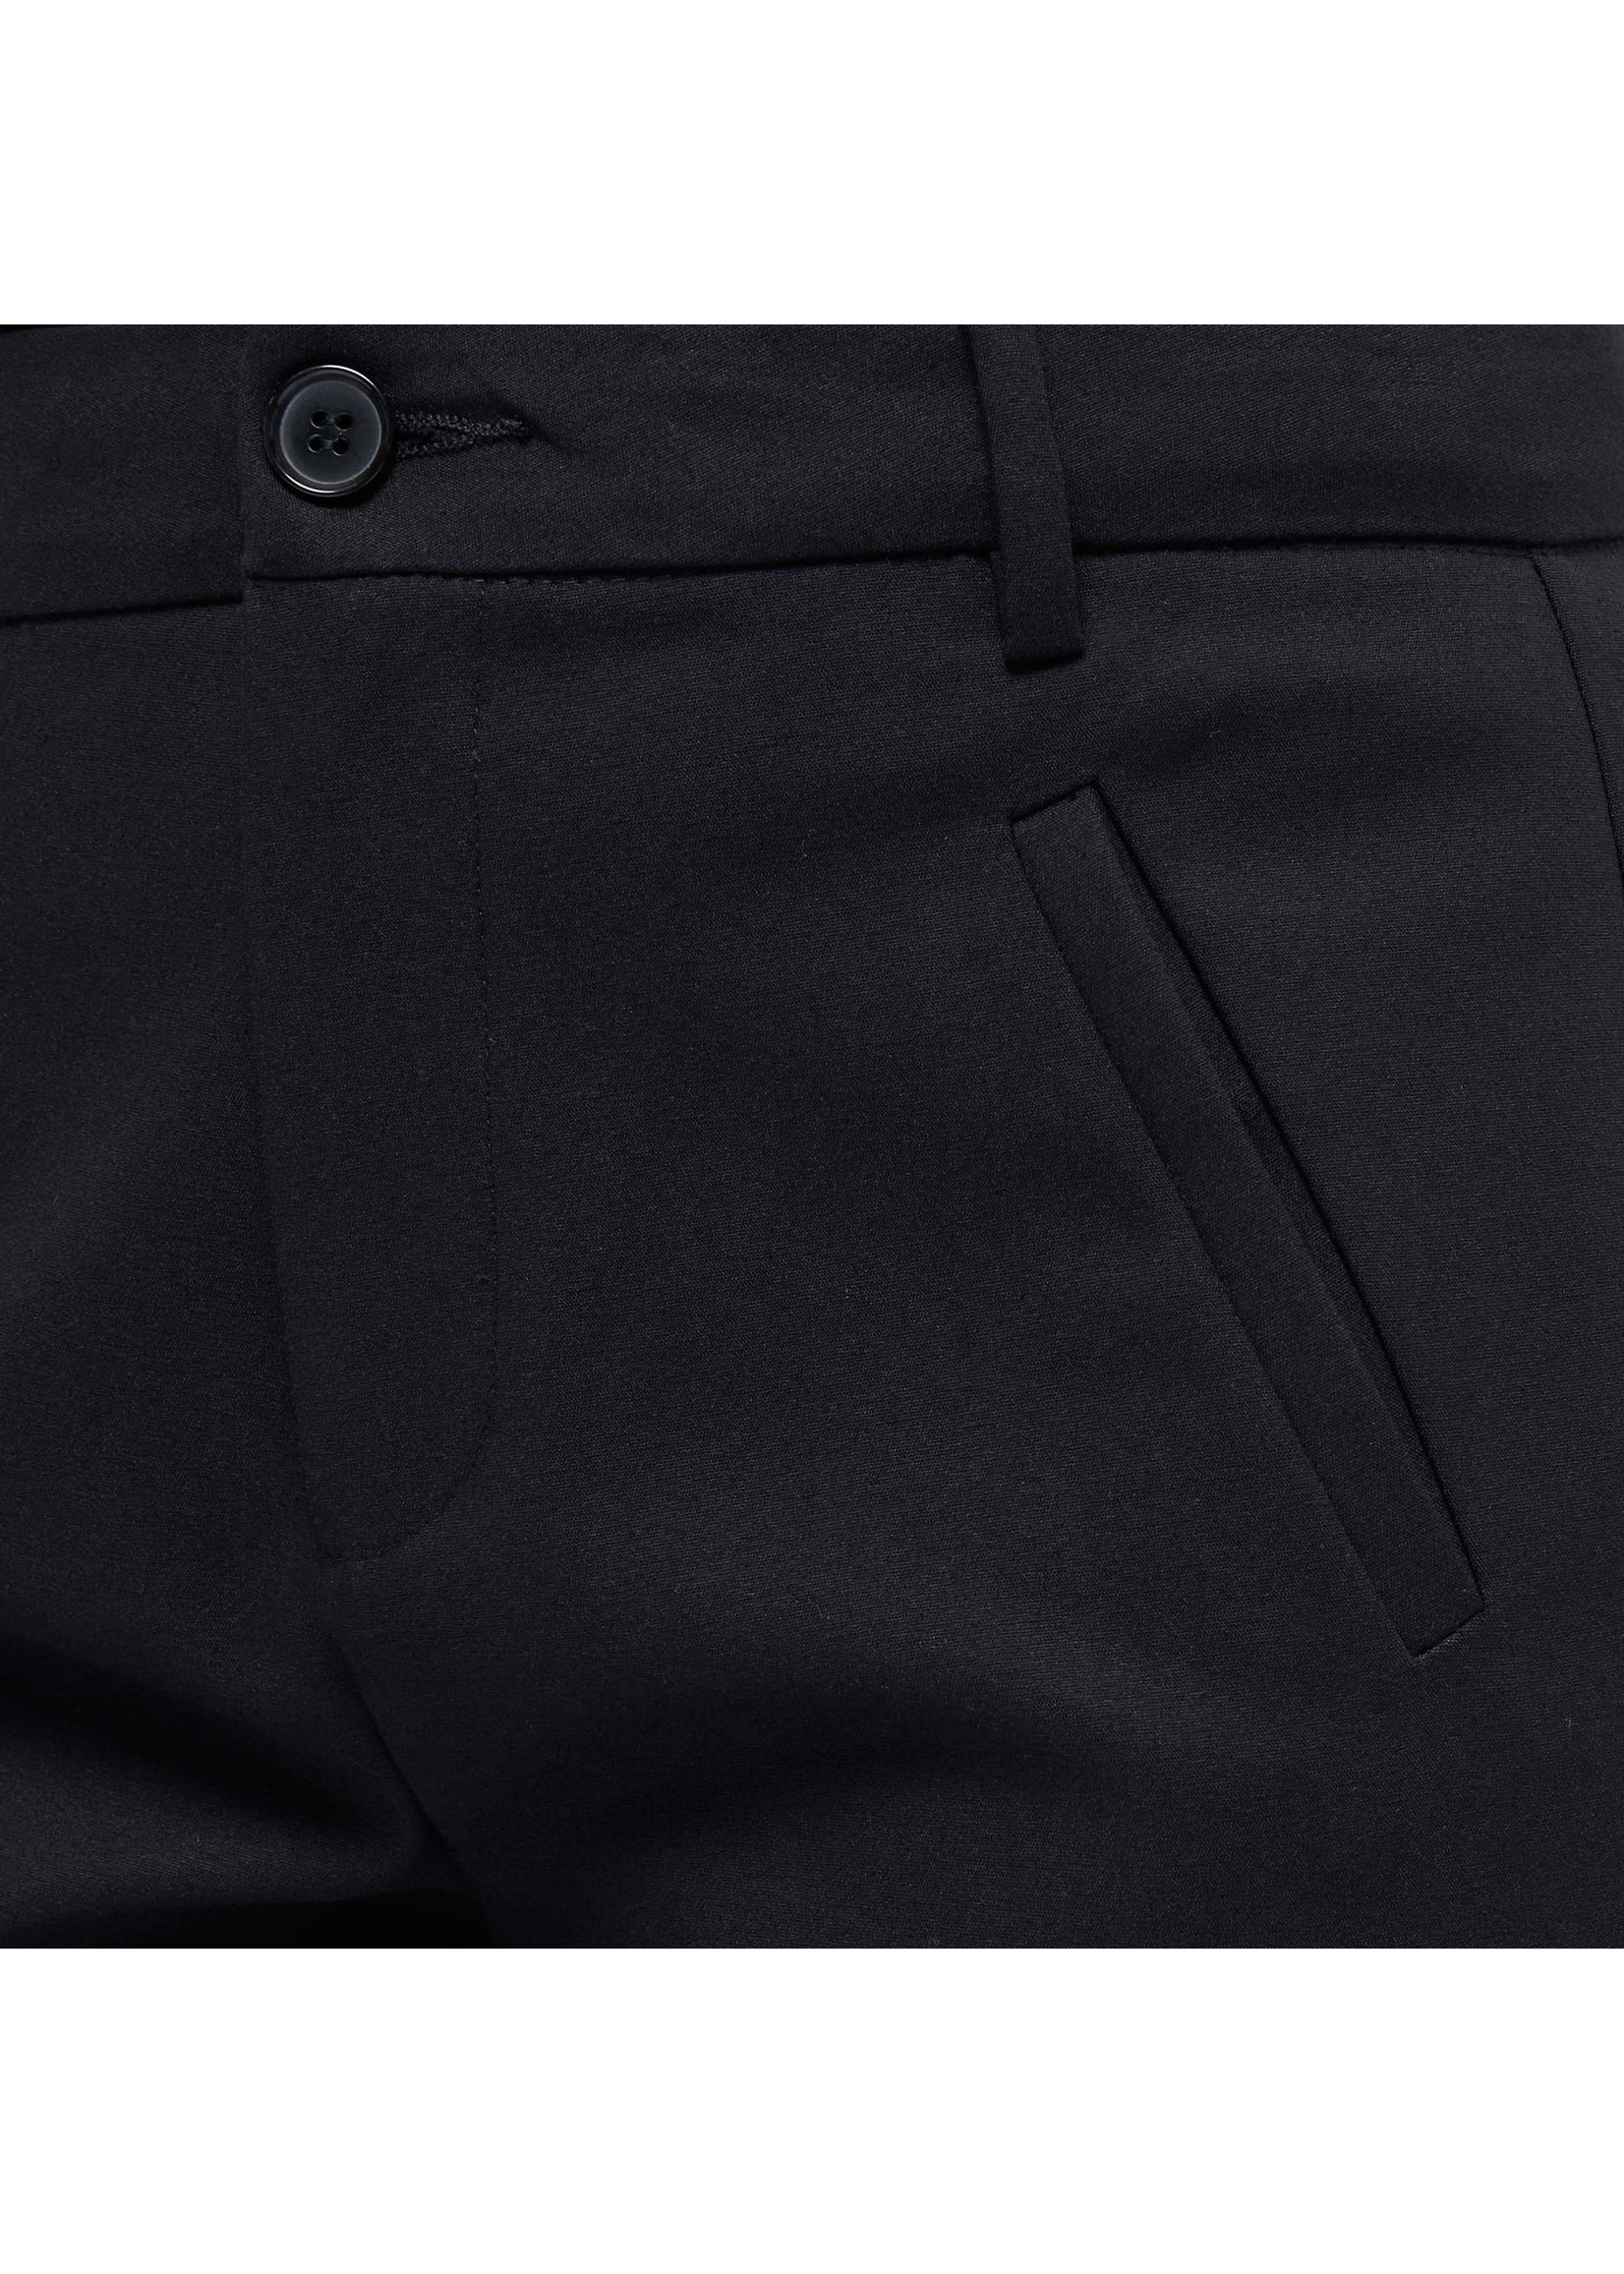 MINUS Daya straigth pants Black